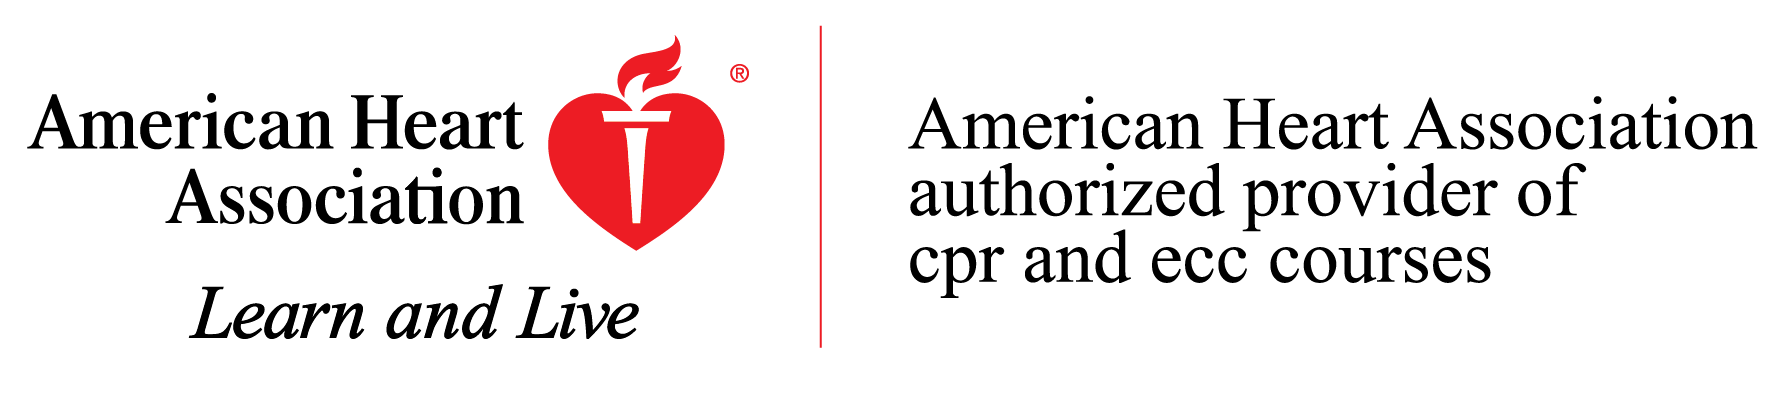 Lifeguard Cpr Certifcation Classes In Westchester Putnam Dutchess